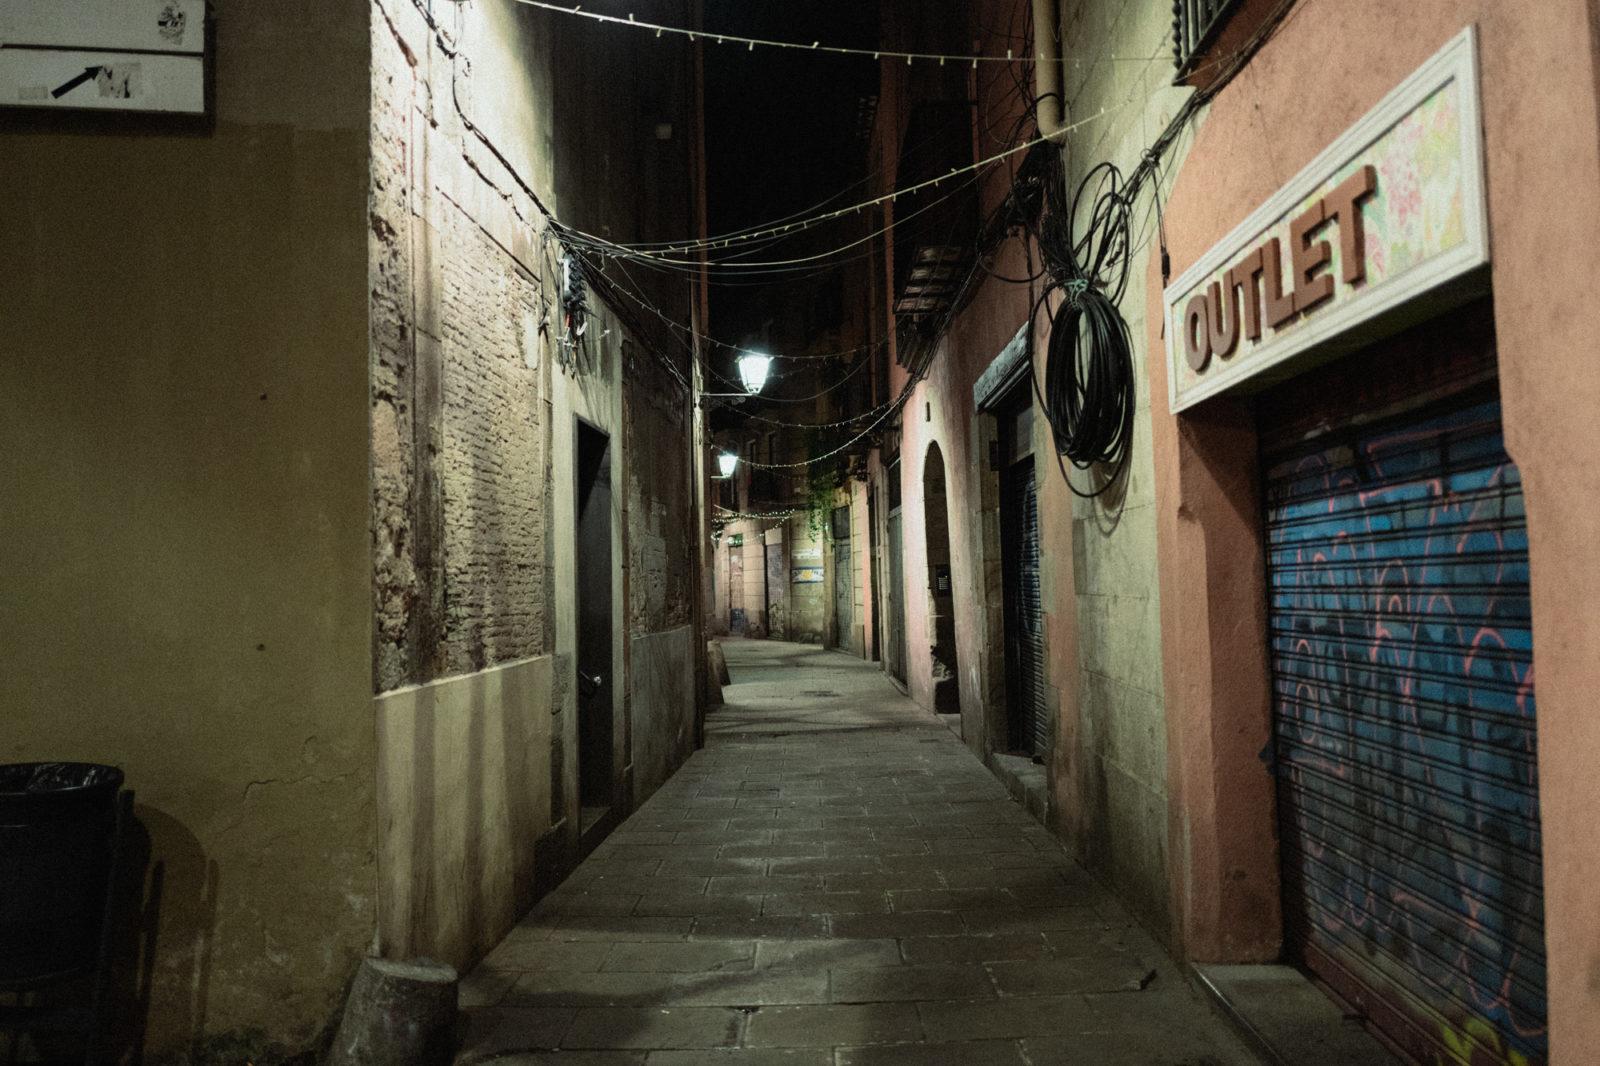 Barcelona Street-1090683